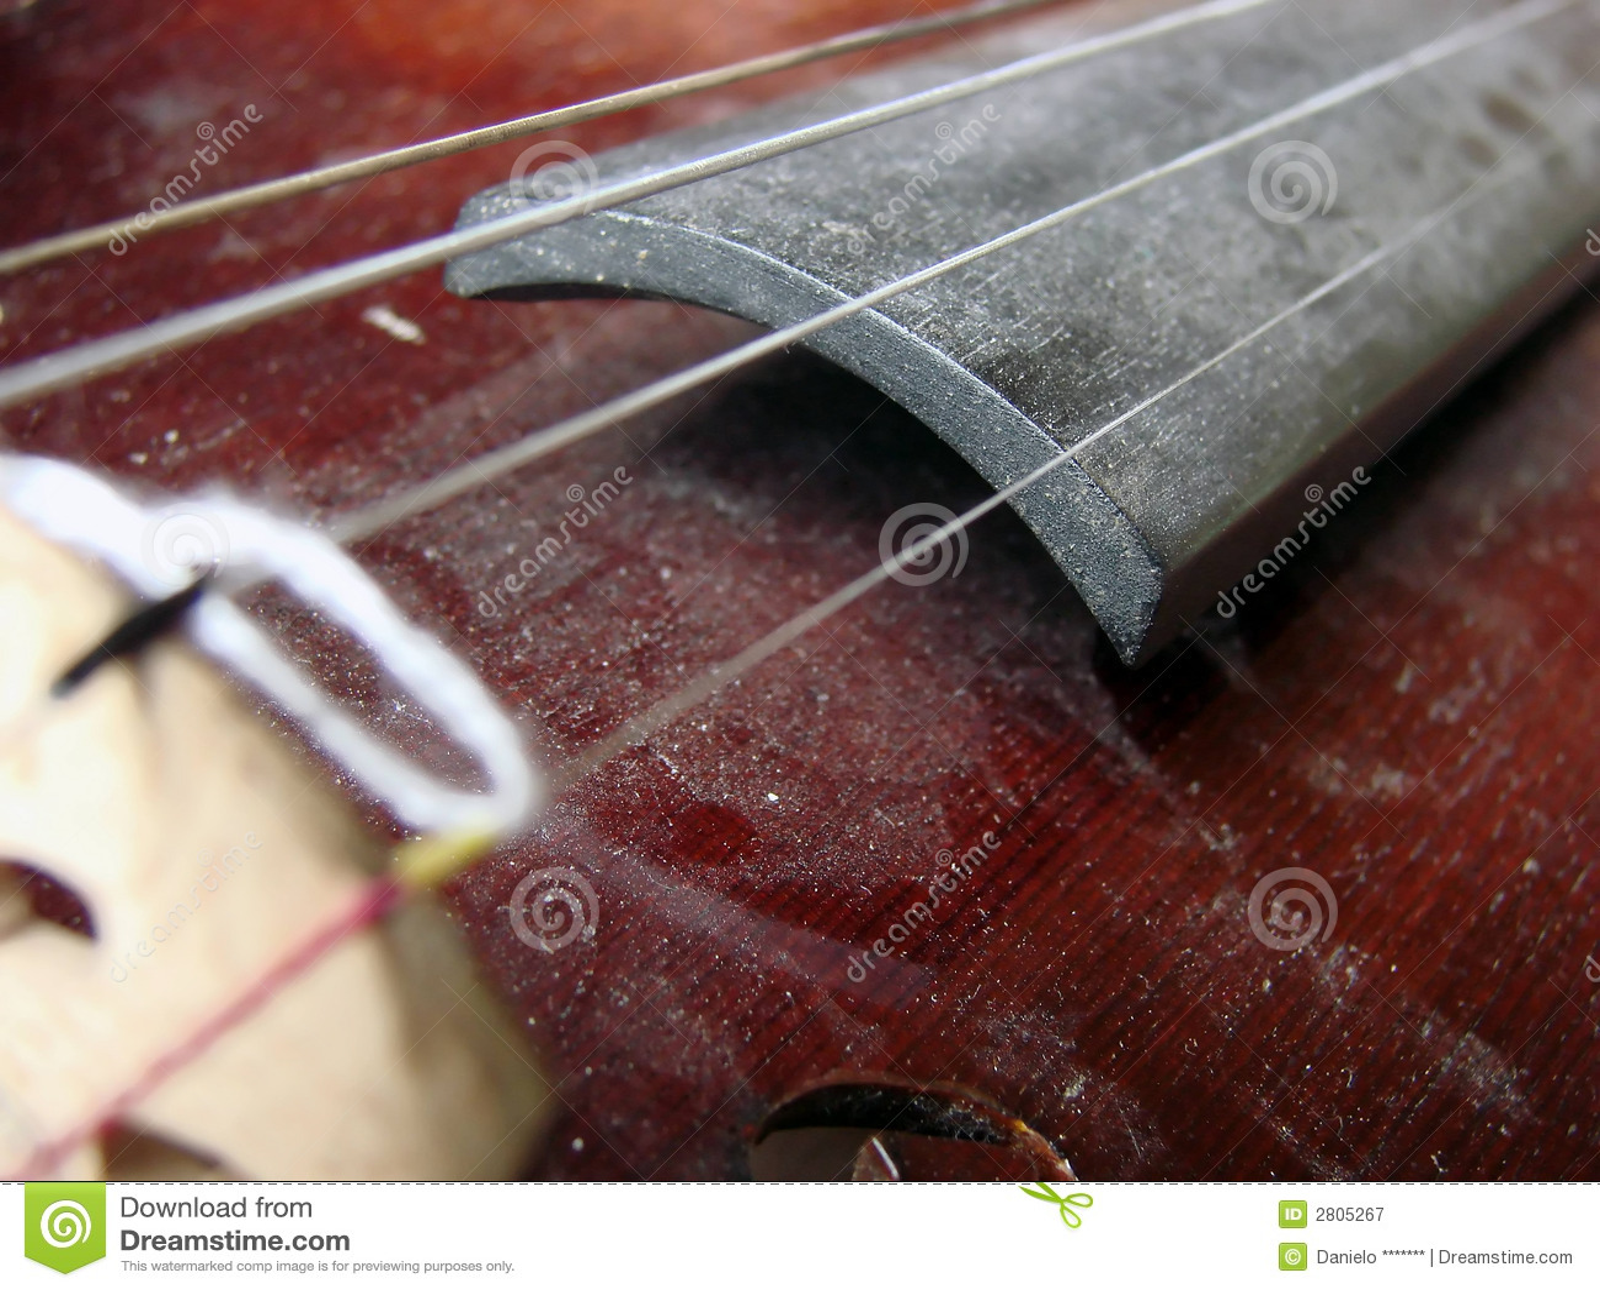 Vintage violine with dust